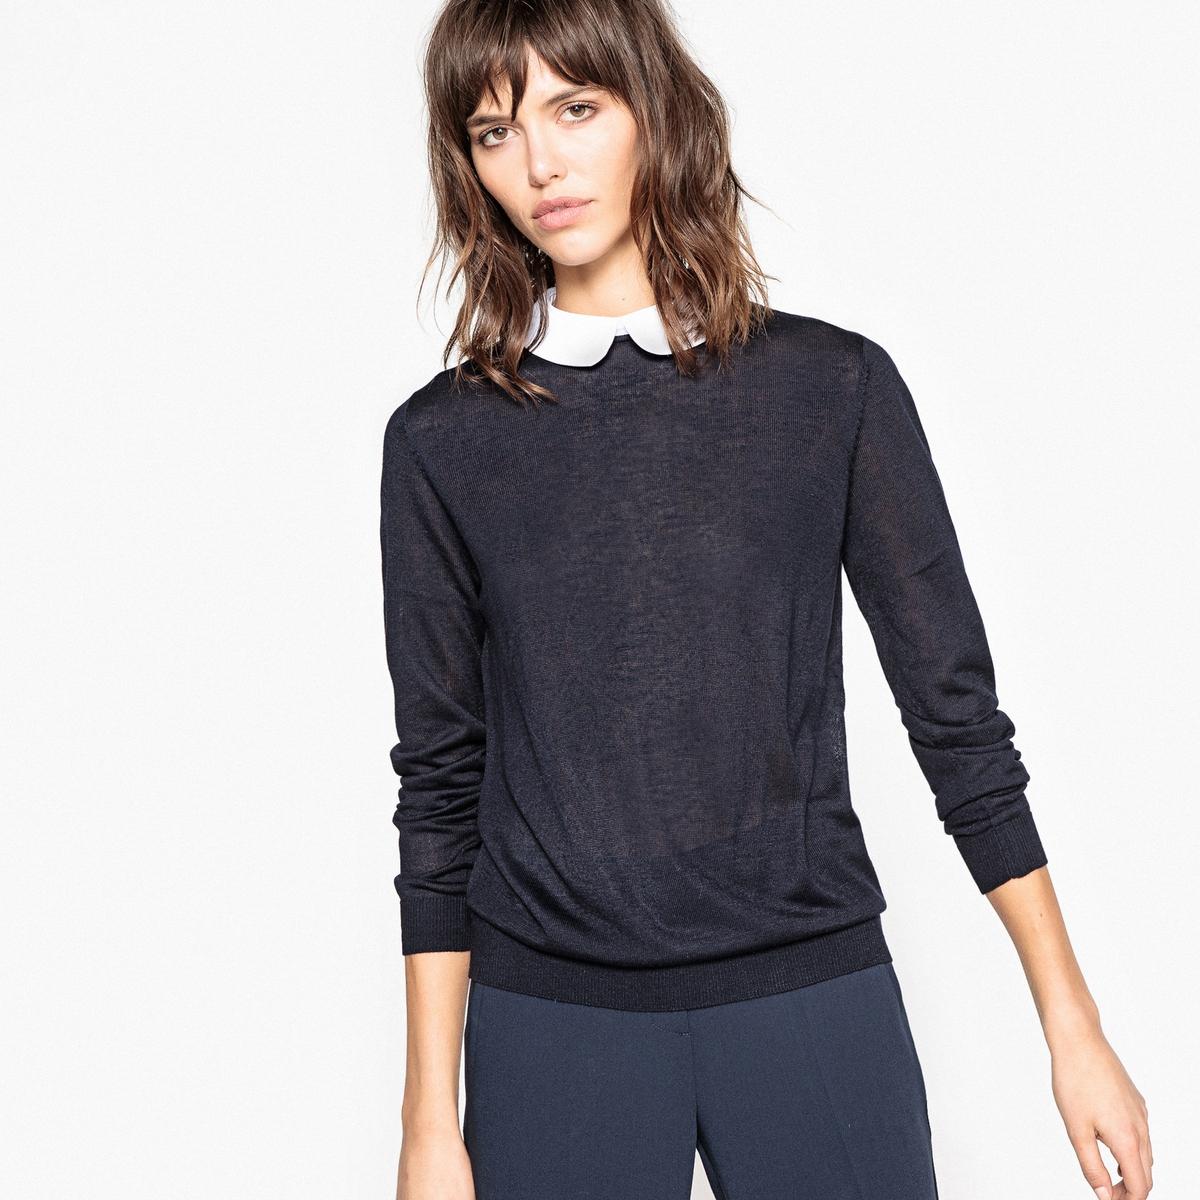 Пуловер MADEMOISELLE R 48985 от LaRedoute